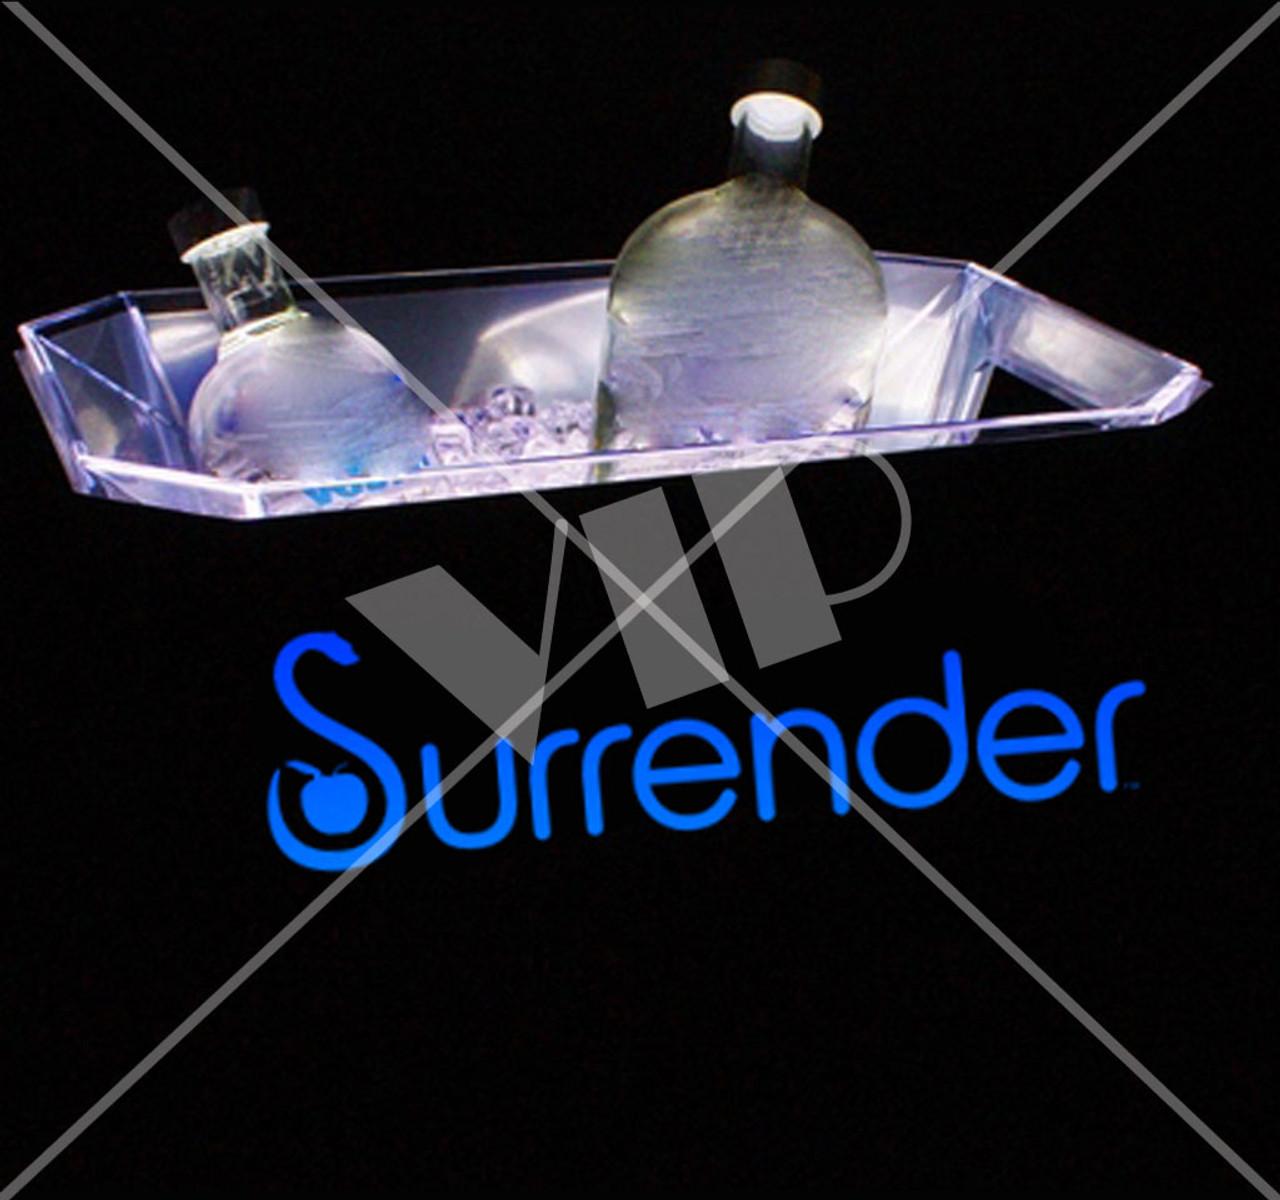 Surrender, XS, Las Vegas, The Palms, Hakkassan, LAX, On the Record, Las Vegas Nightclub, Ice bucket, custom